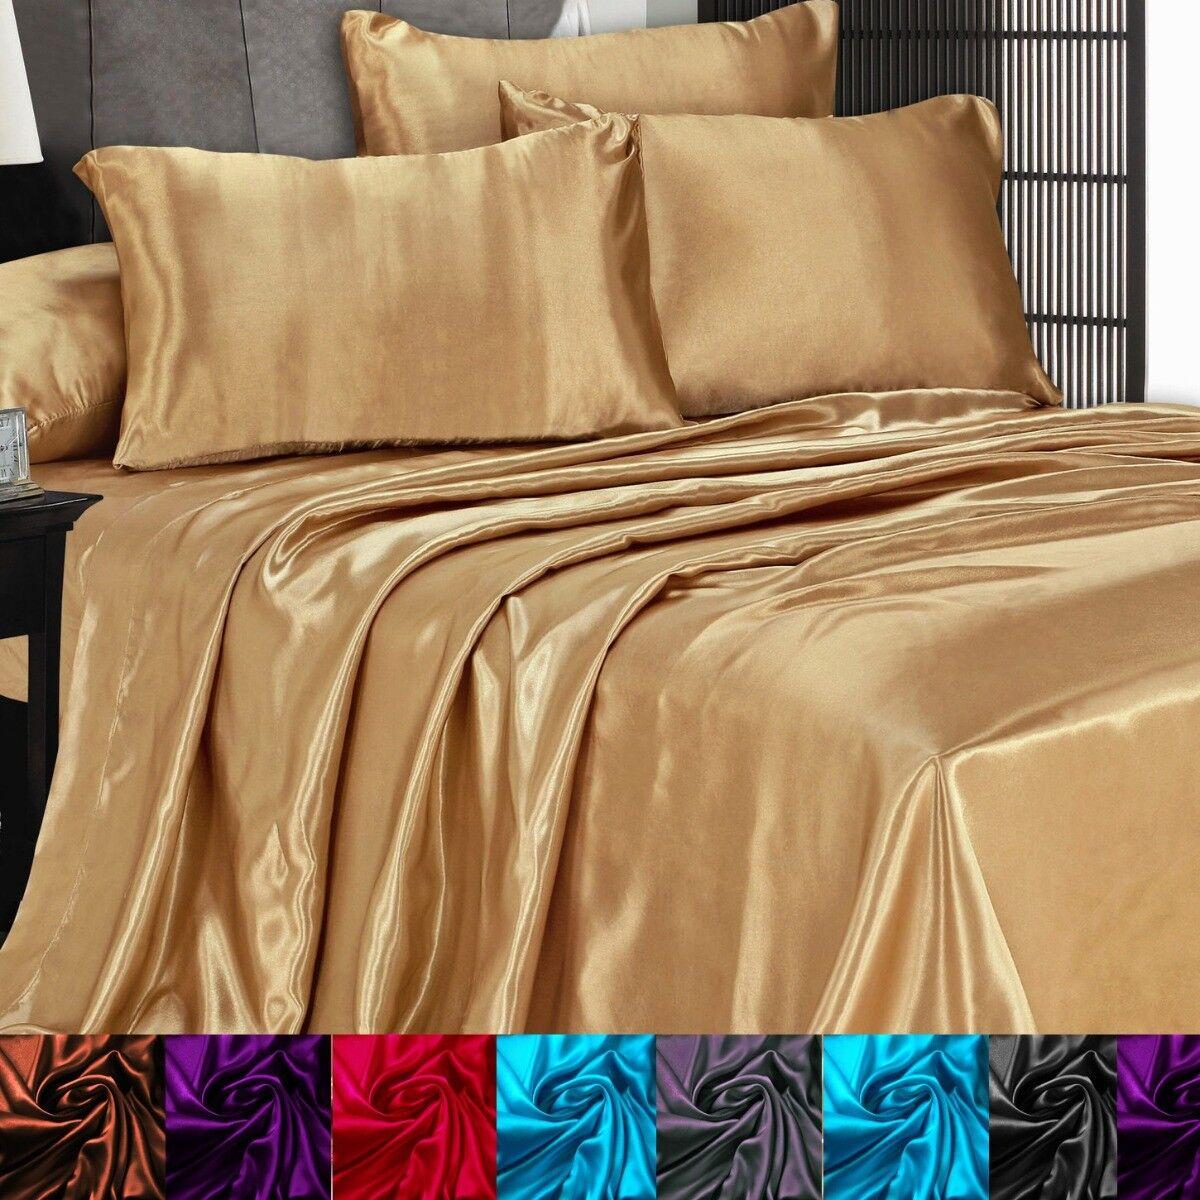 satin silky sheet set queen king size